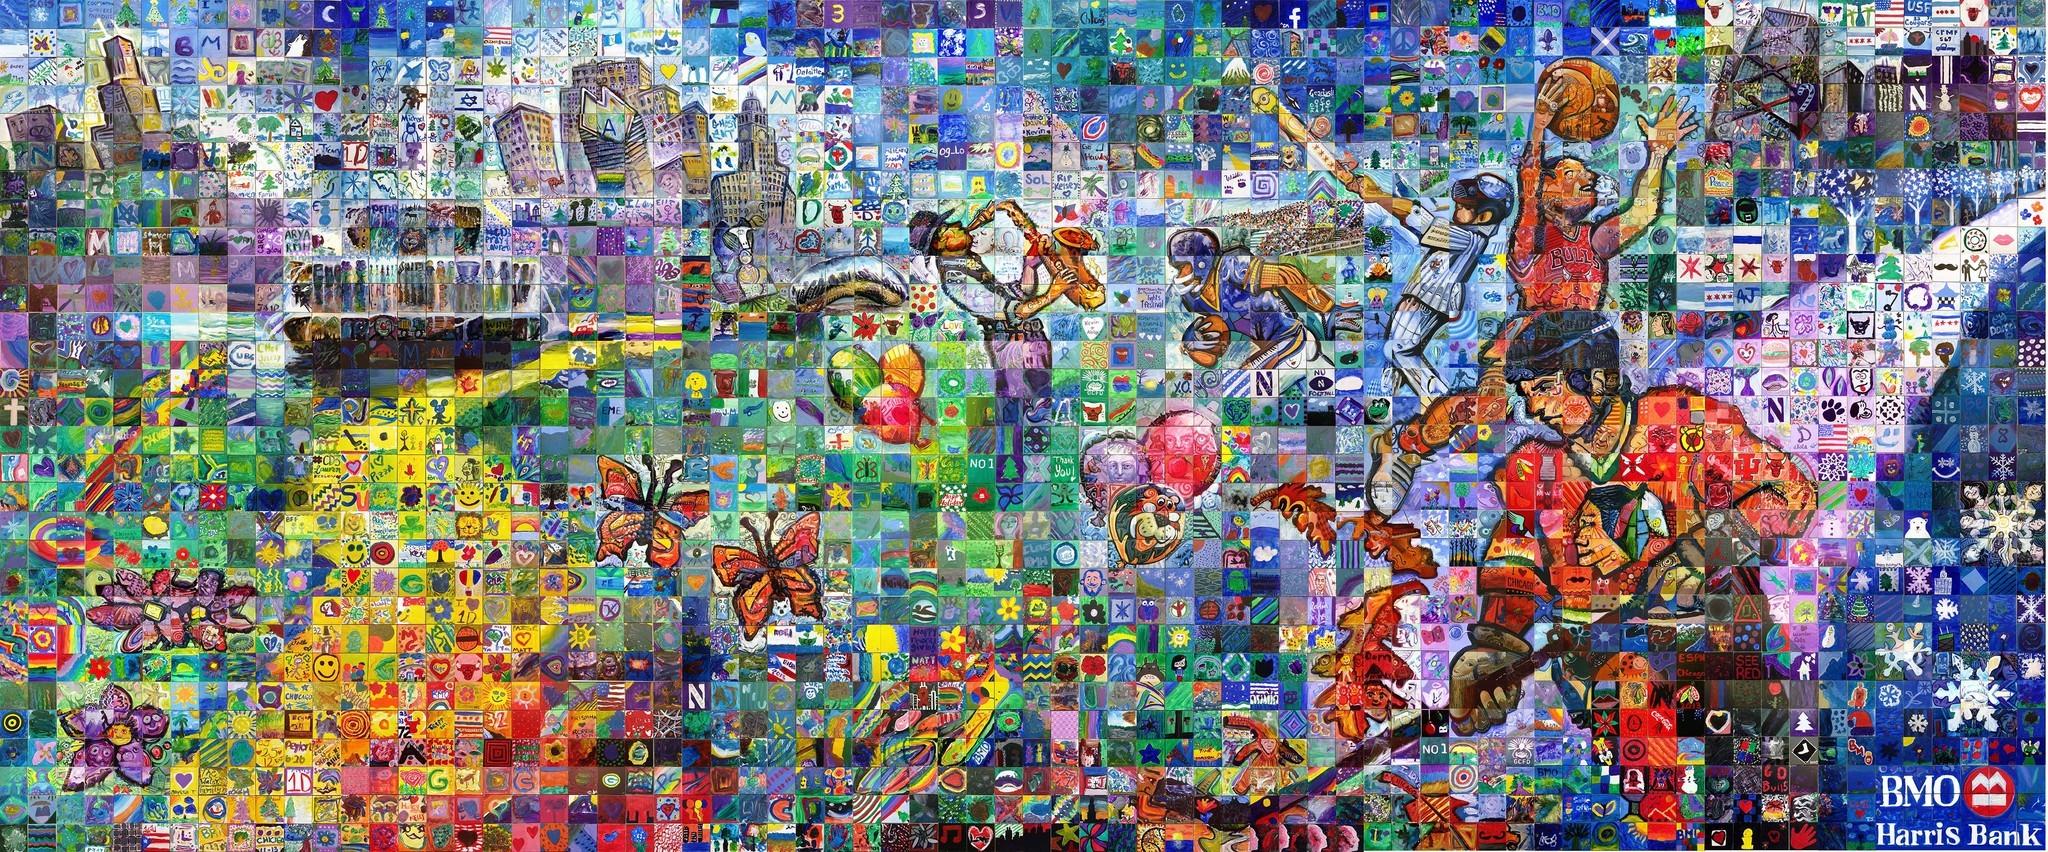 The BMO Harris Bank Community Art Project: Many Small ...